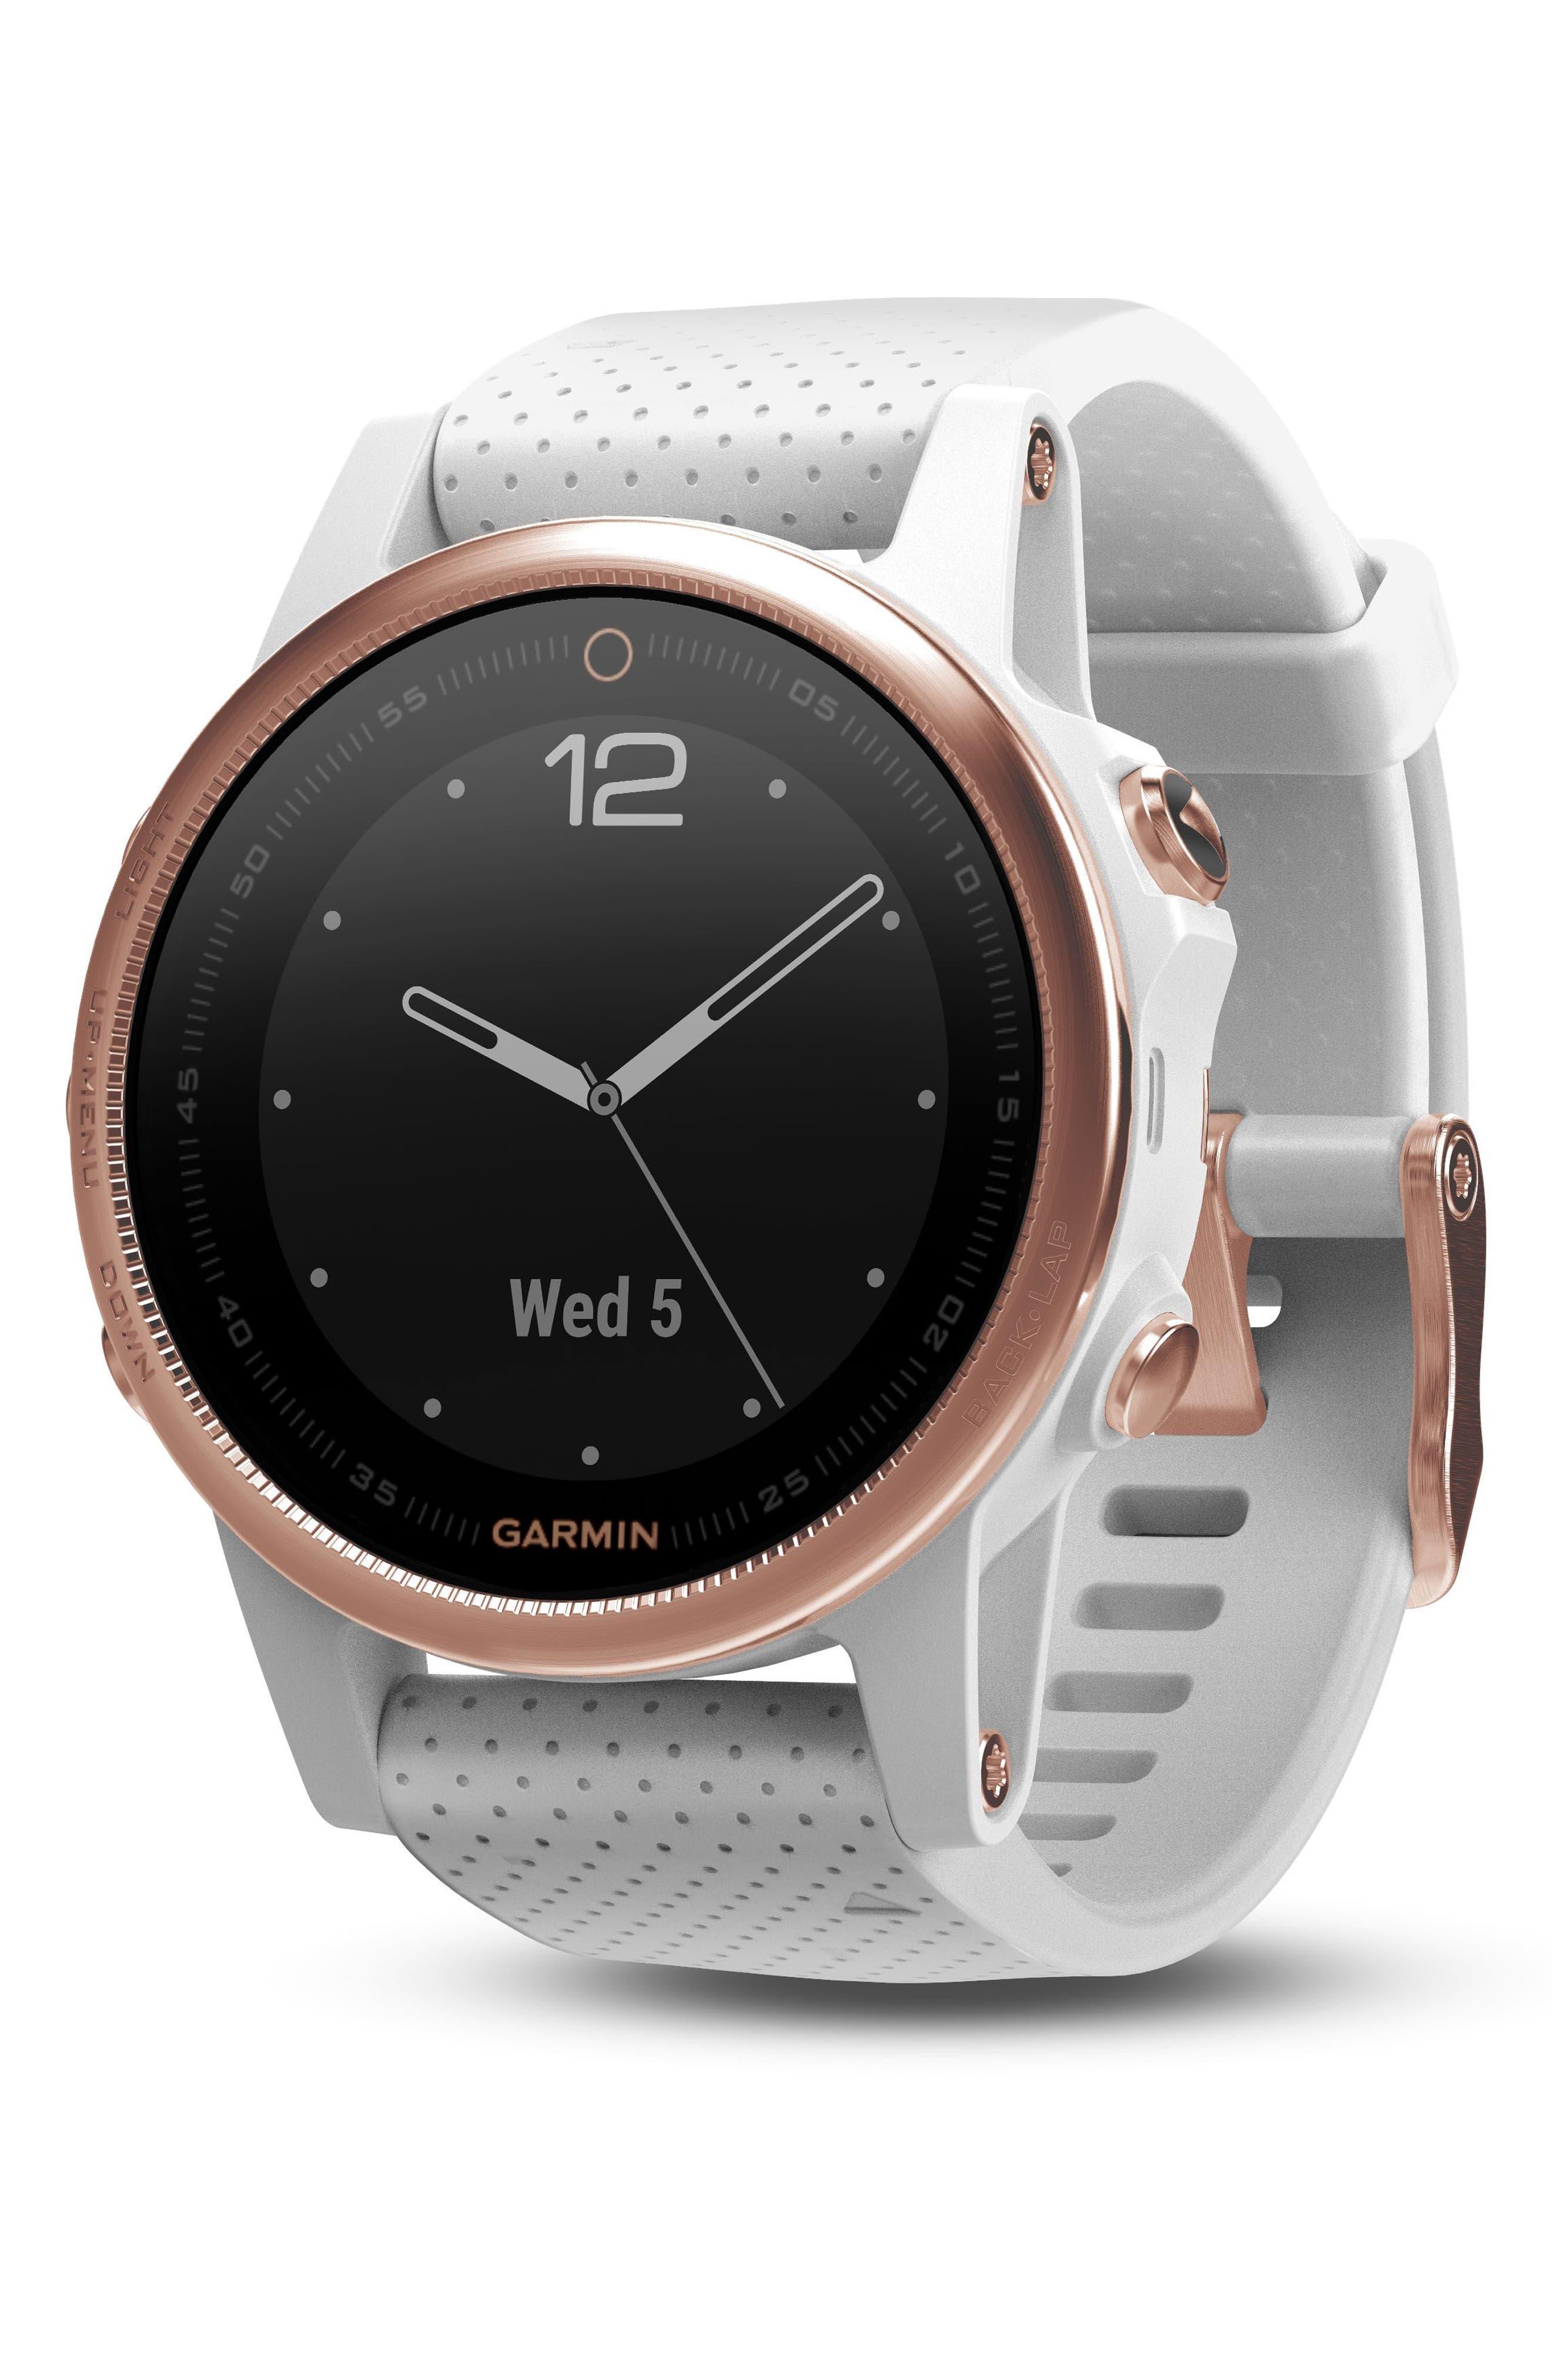 fenix<sup>®</sup> 5S Sapphire Premium Multisport GPS Watch, 42mm,                             Main thumbnail 1, color,                             White/ Rose Gold Sapphire